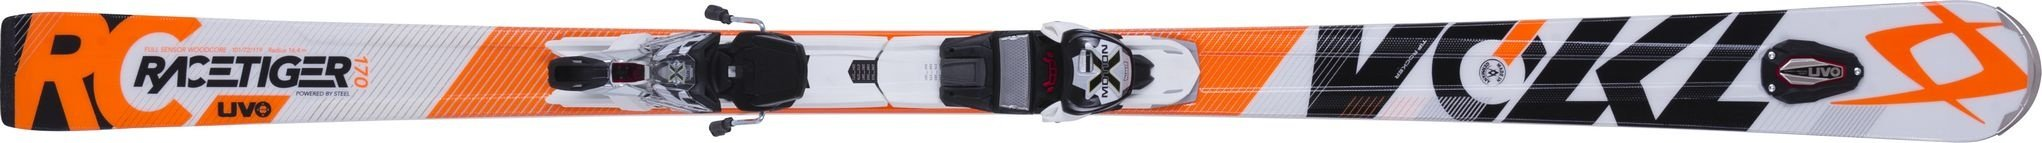 RACETIGER RC UVO (ORANGE / RED)